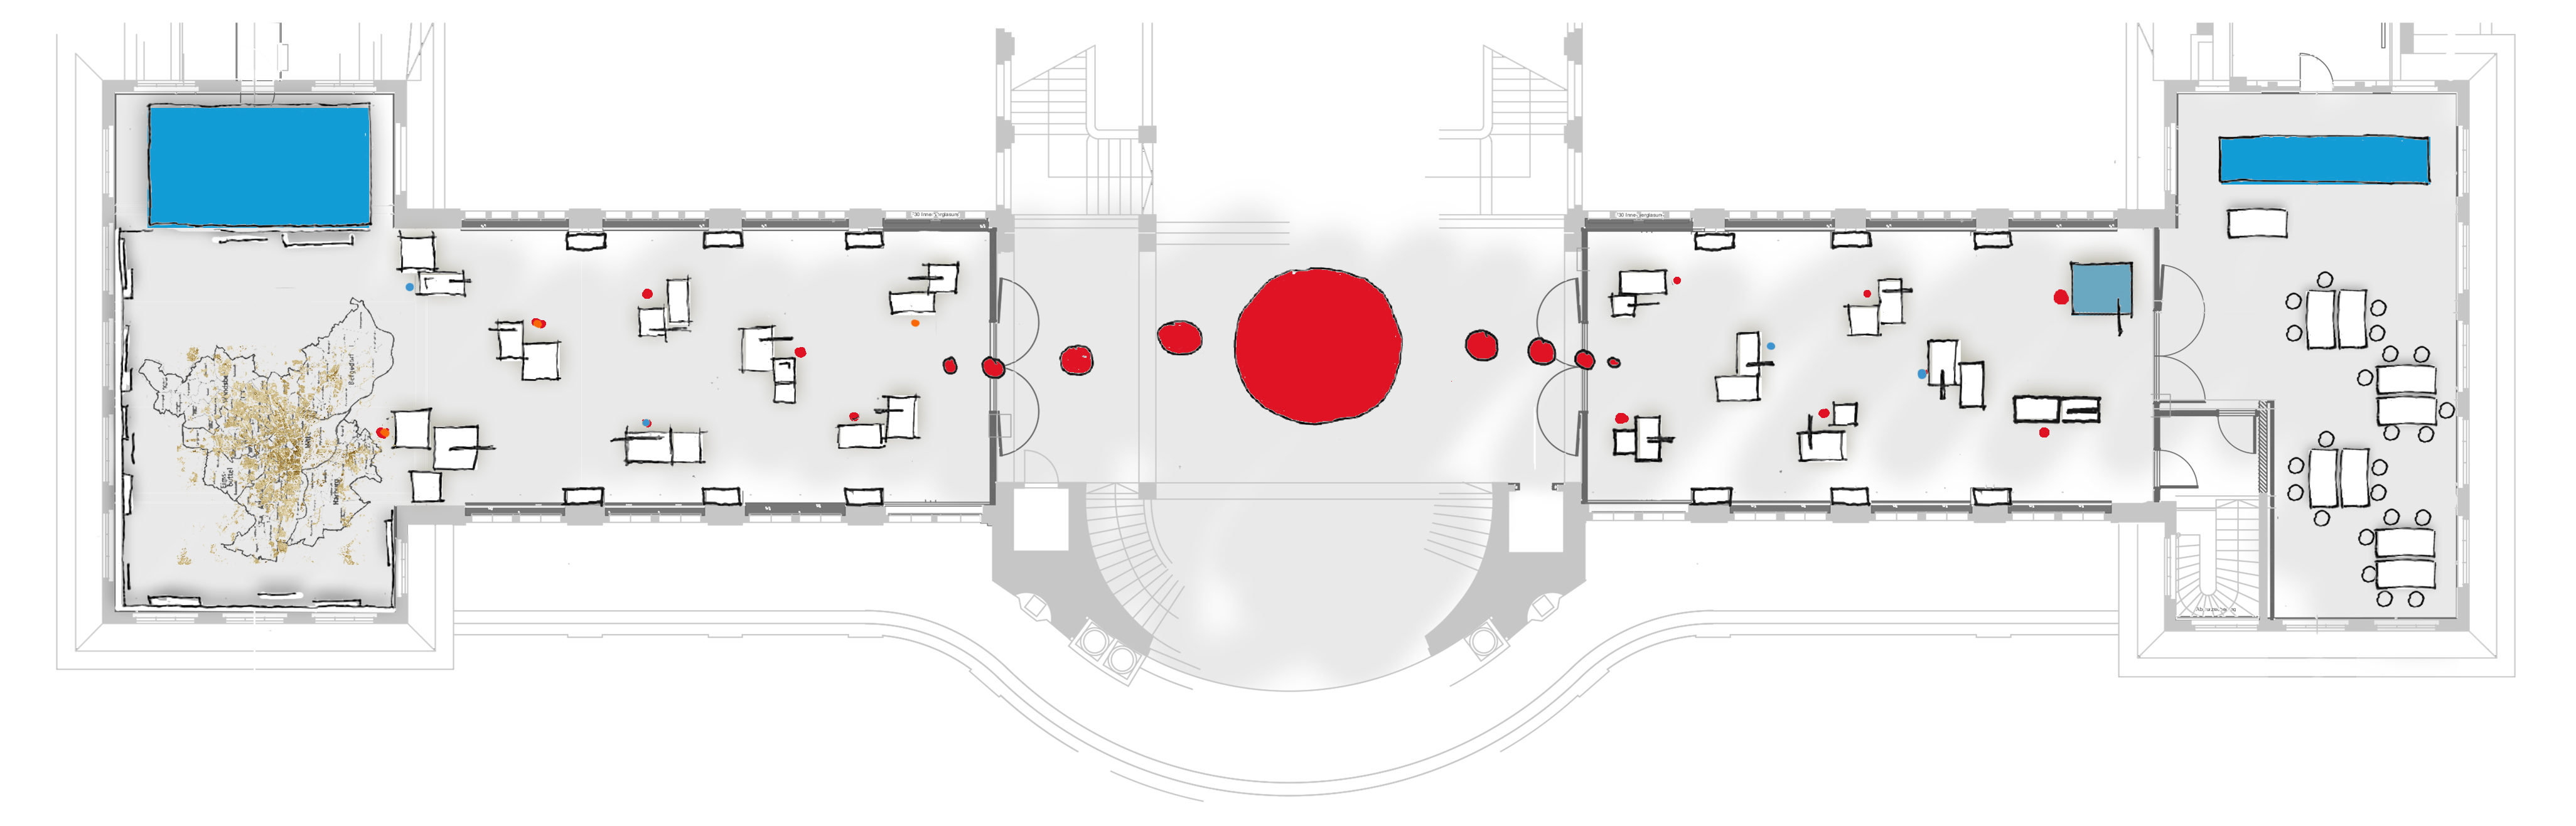 Grundriss des Museums: rechts und links des Foyers